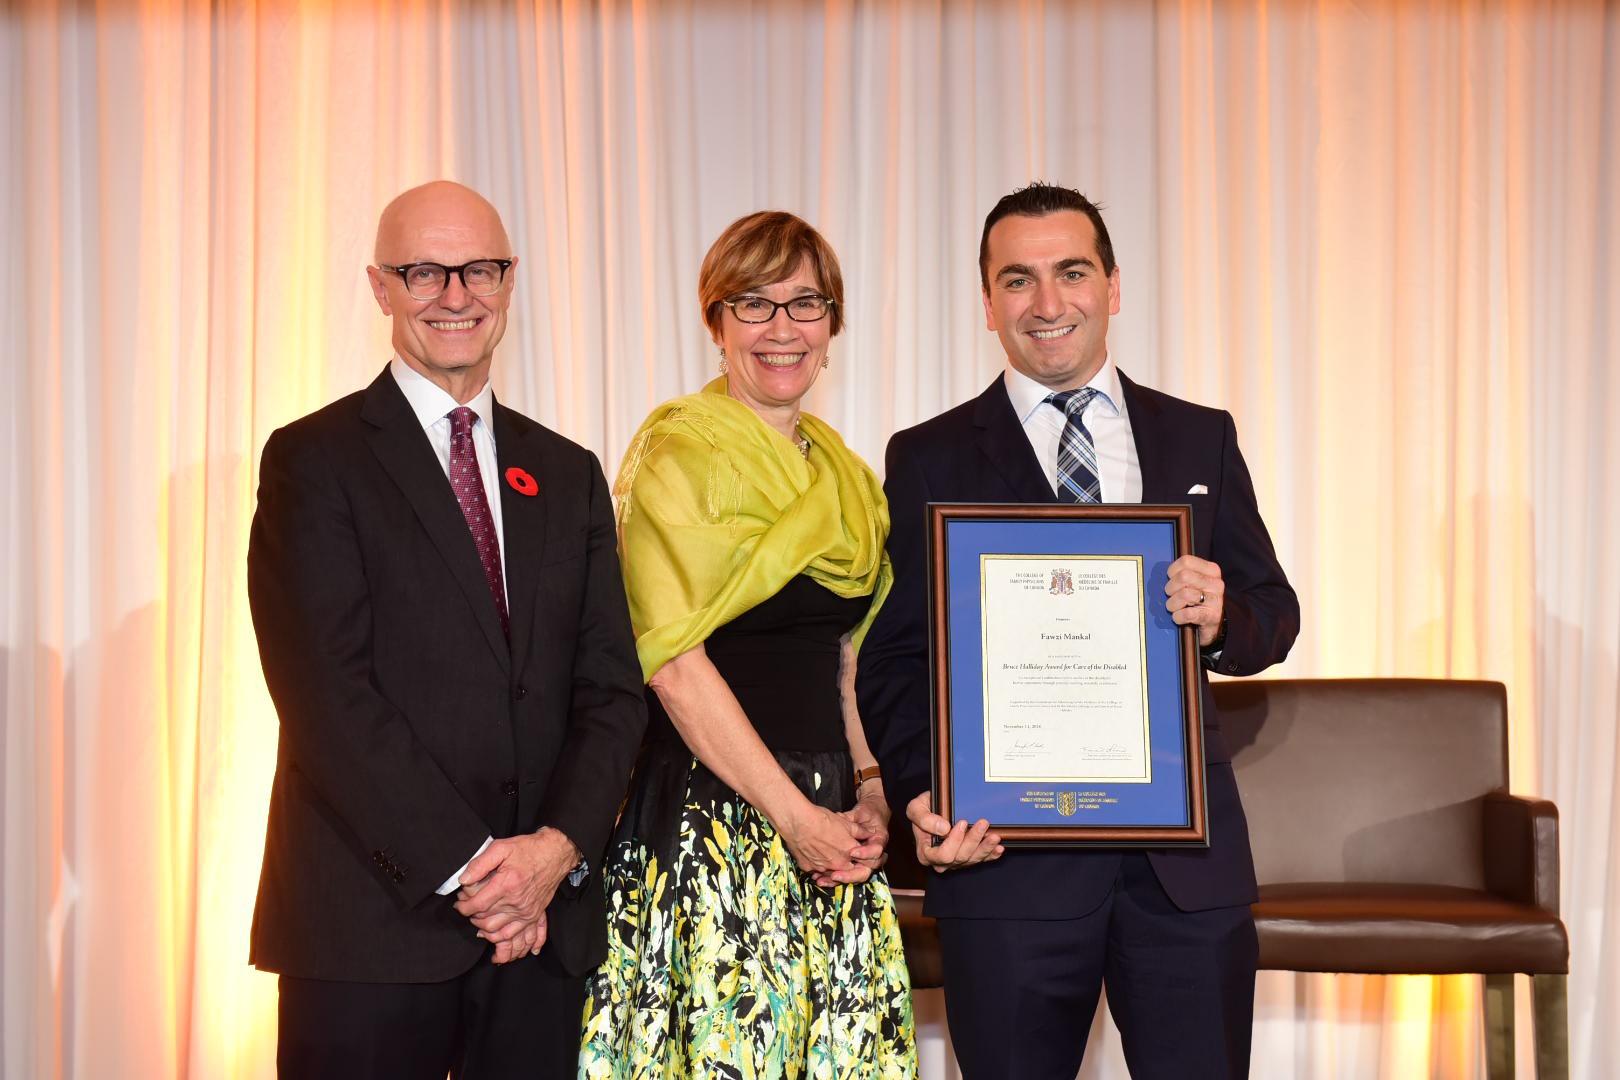 Photo of Dr. Fawzi Mankal receiving an award at the November 11 gala.